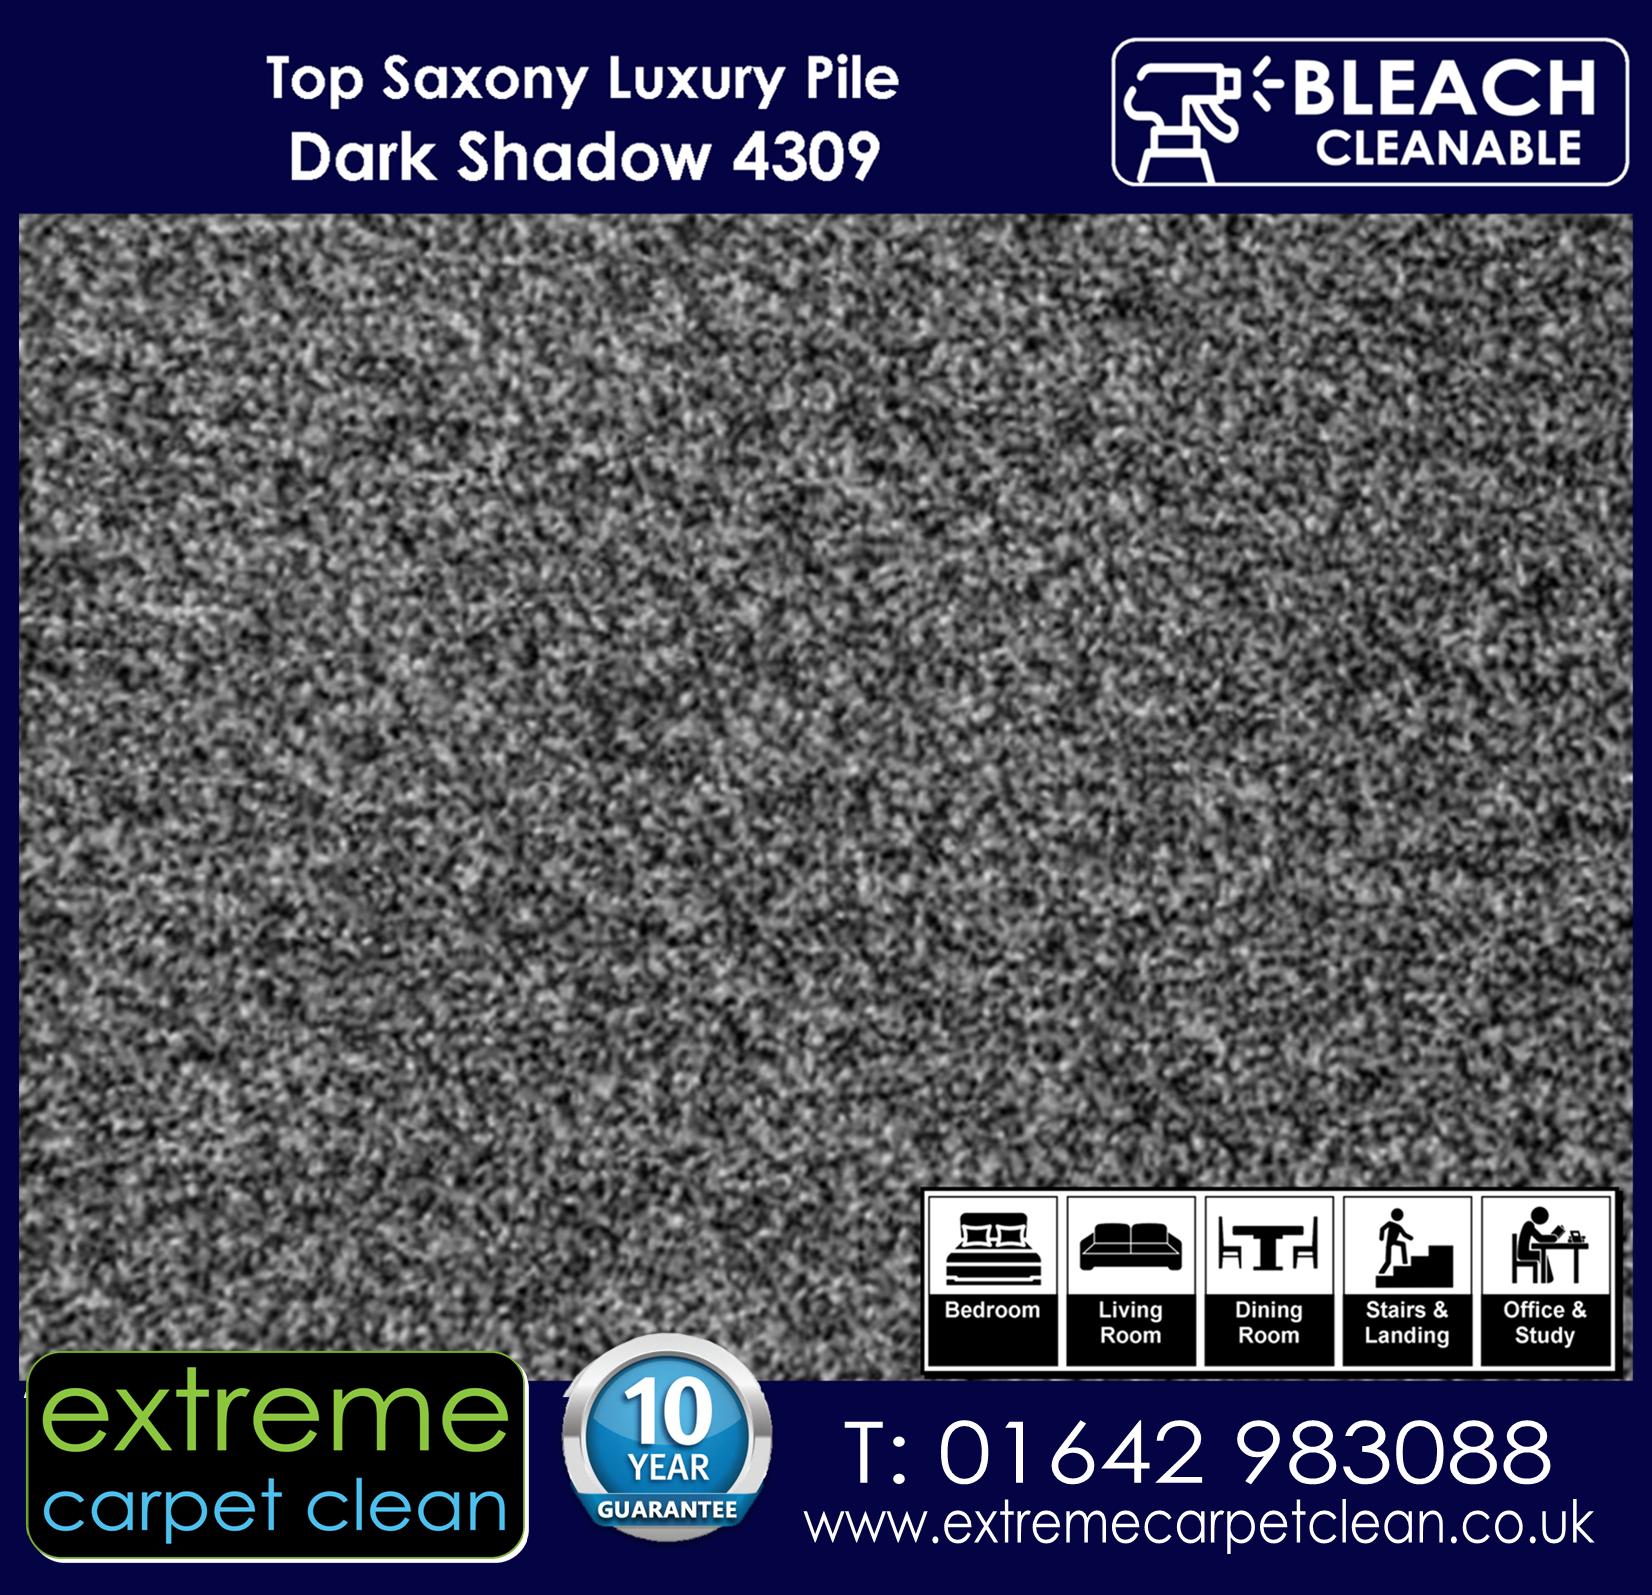 Extreme Carpet Clean Top Saxony Dark Shadow  Carpet 4309